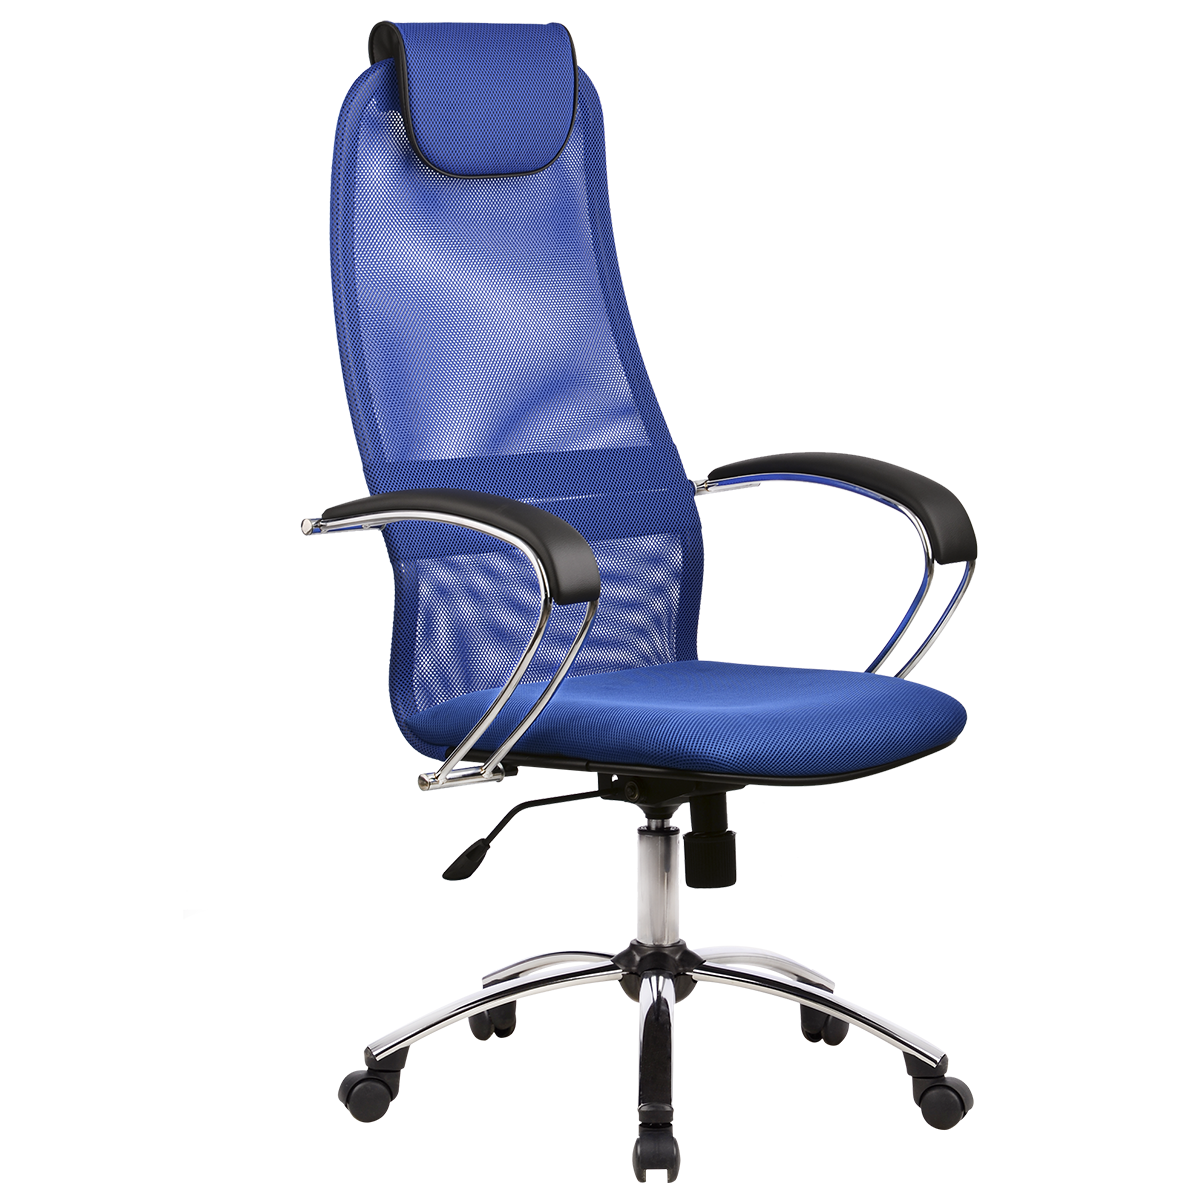 Кресло офисное Metta BK-8 CH 23 синий